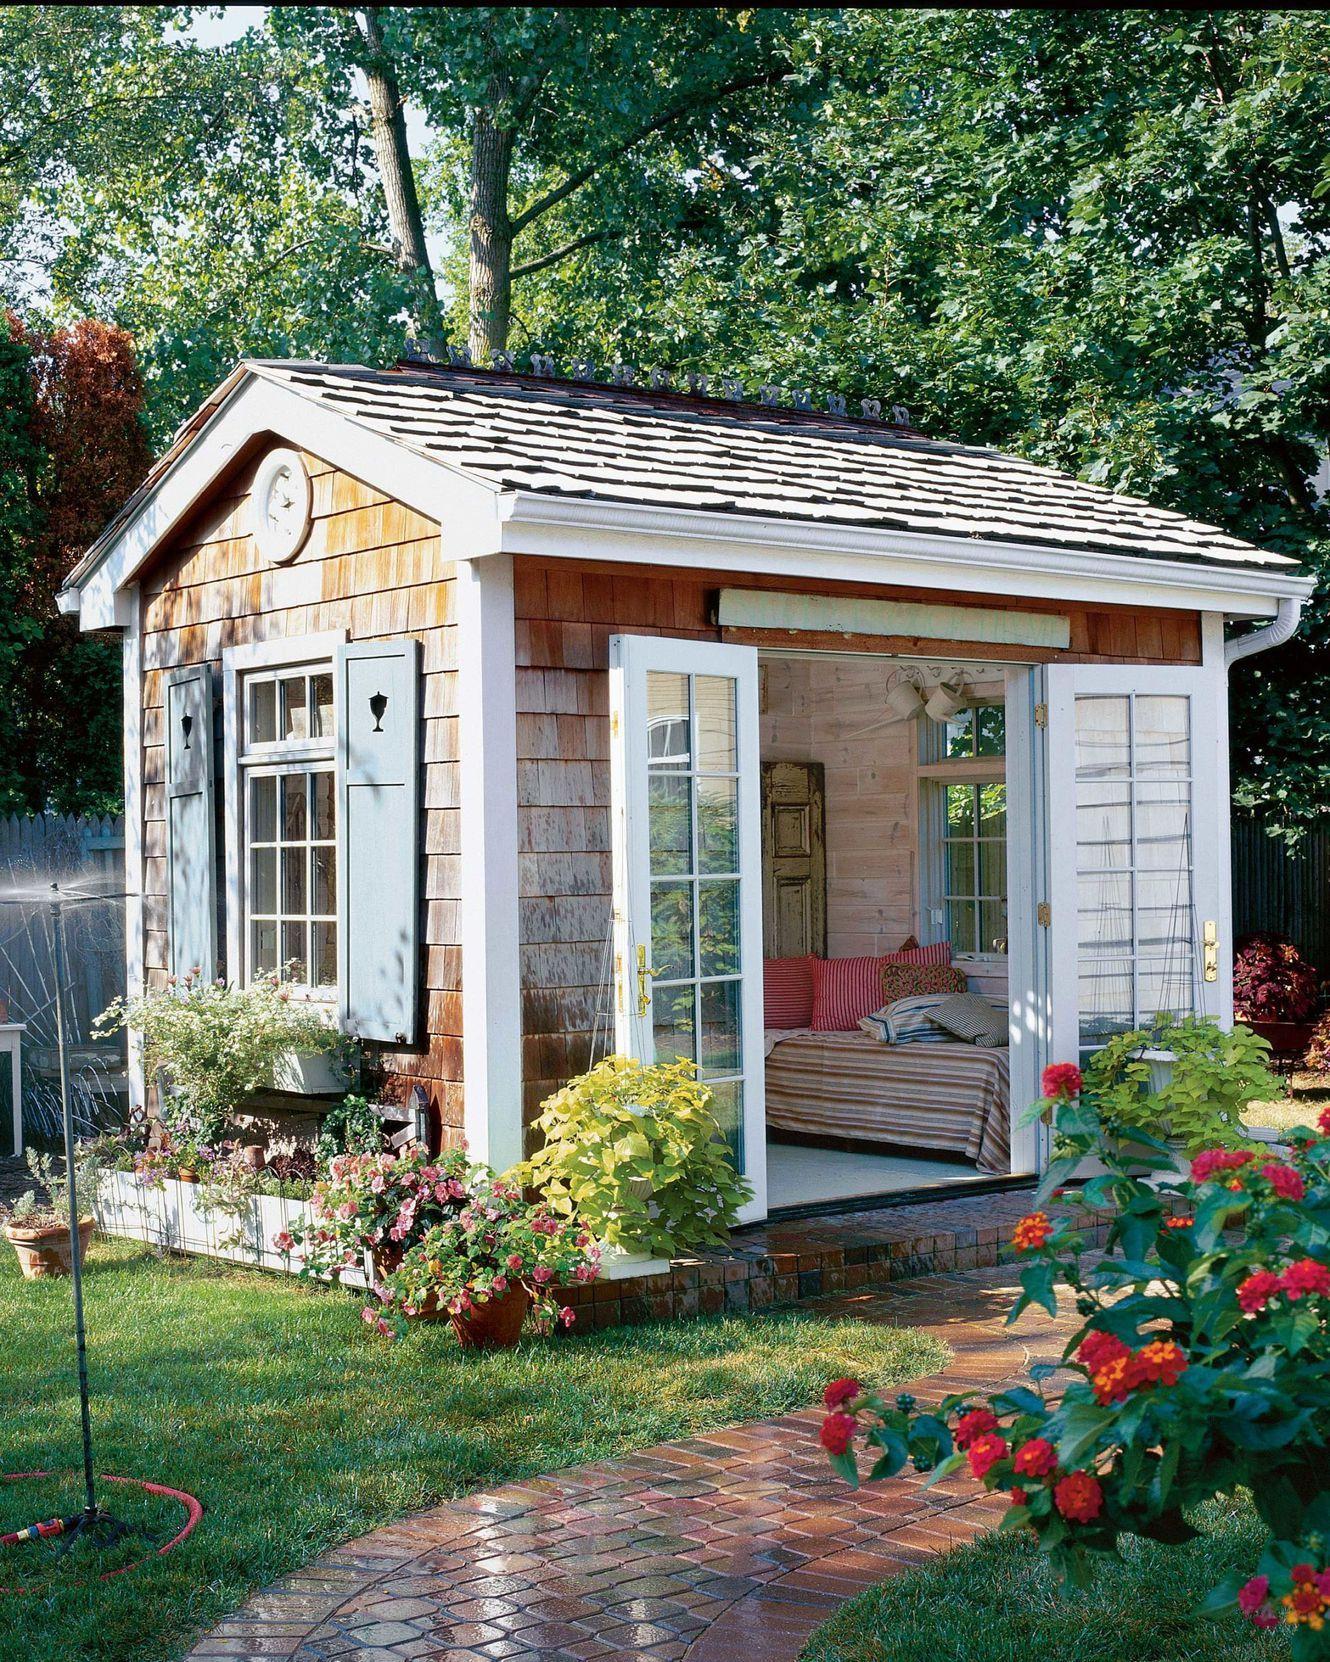 The Ultimate Guide To Building Your Own She Shed Backyard Sheds Backyard Getaway Shed Decor